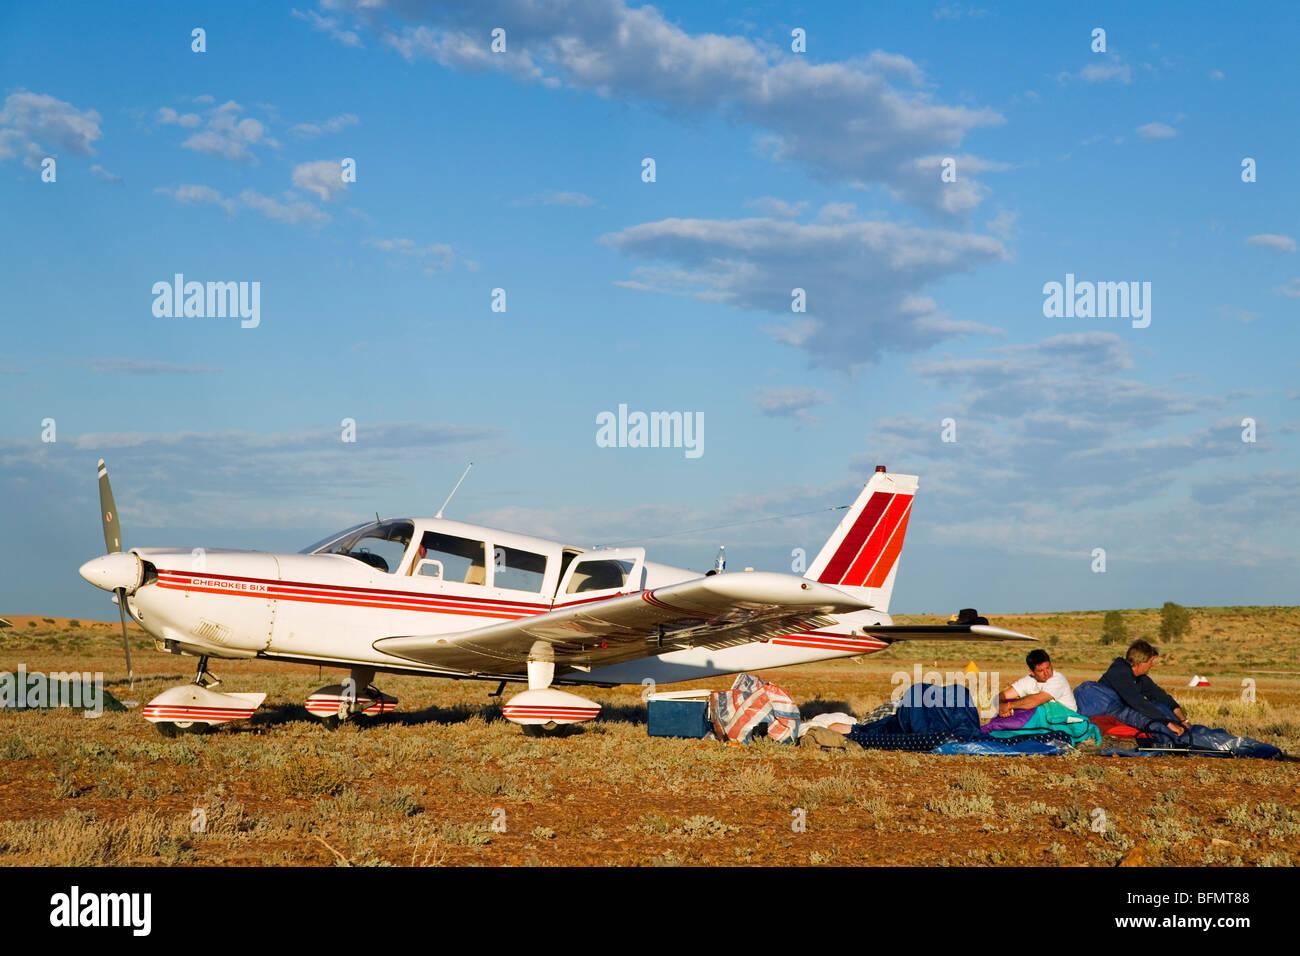 Australia, Queensland, Birdsville.  Men camp next to their plane on a bush airstrip during the annual Birdsville - Stock Image